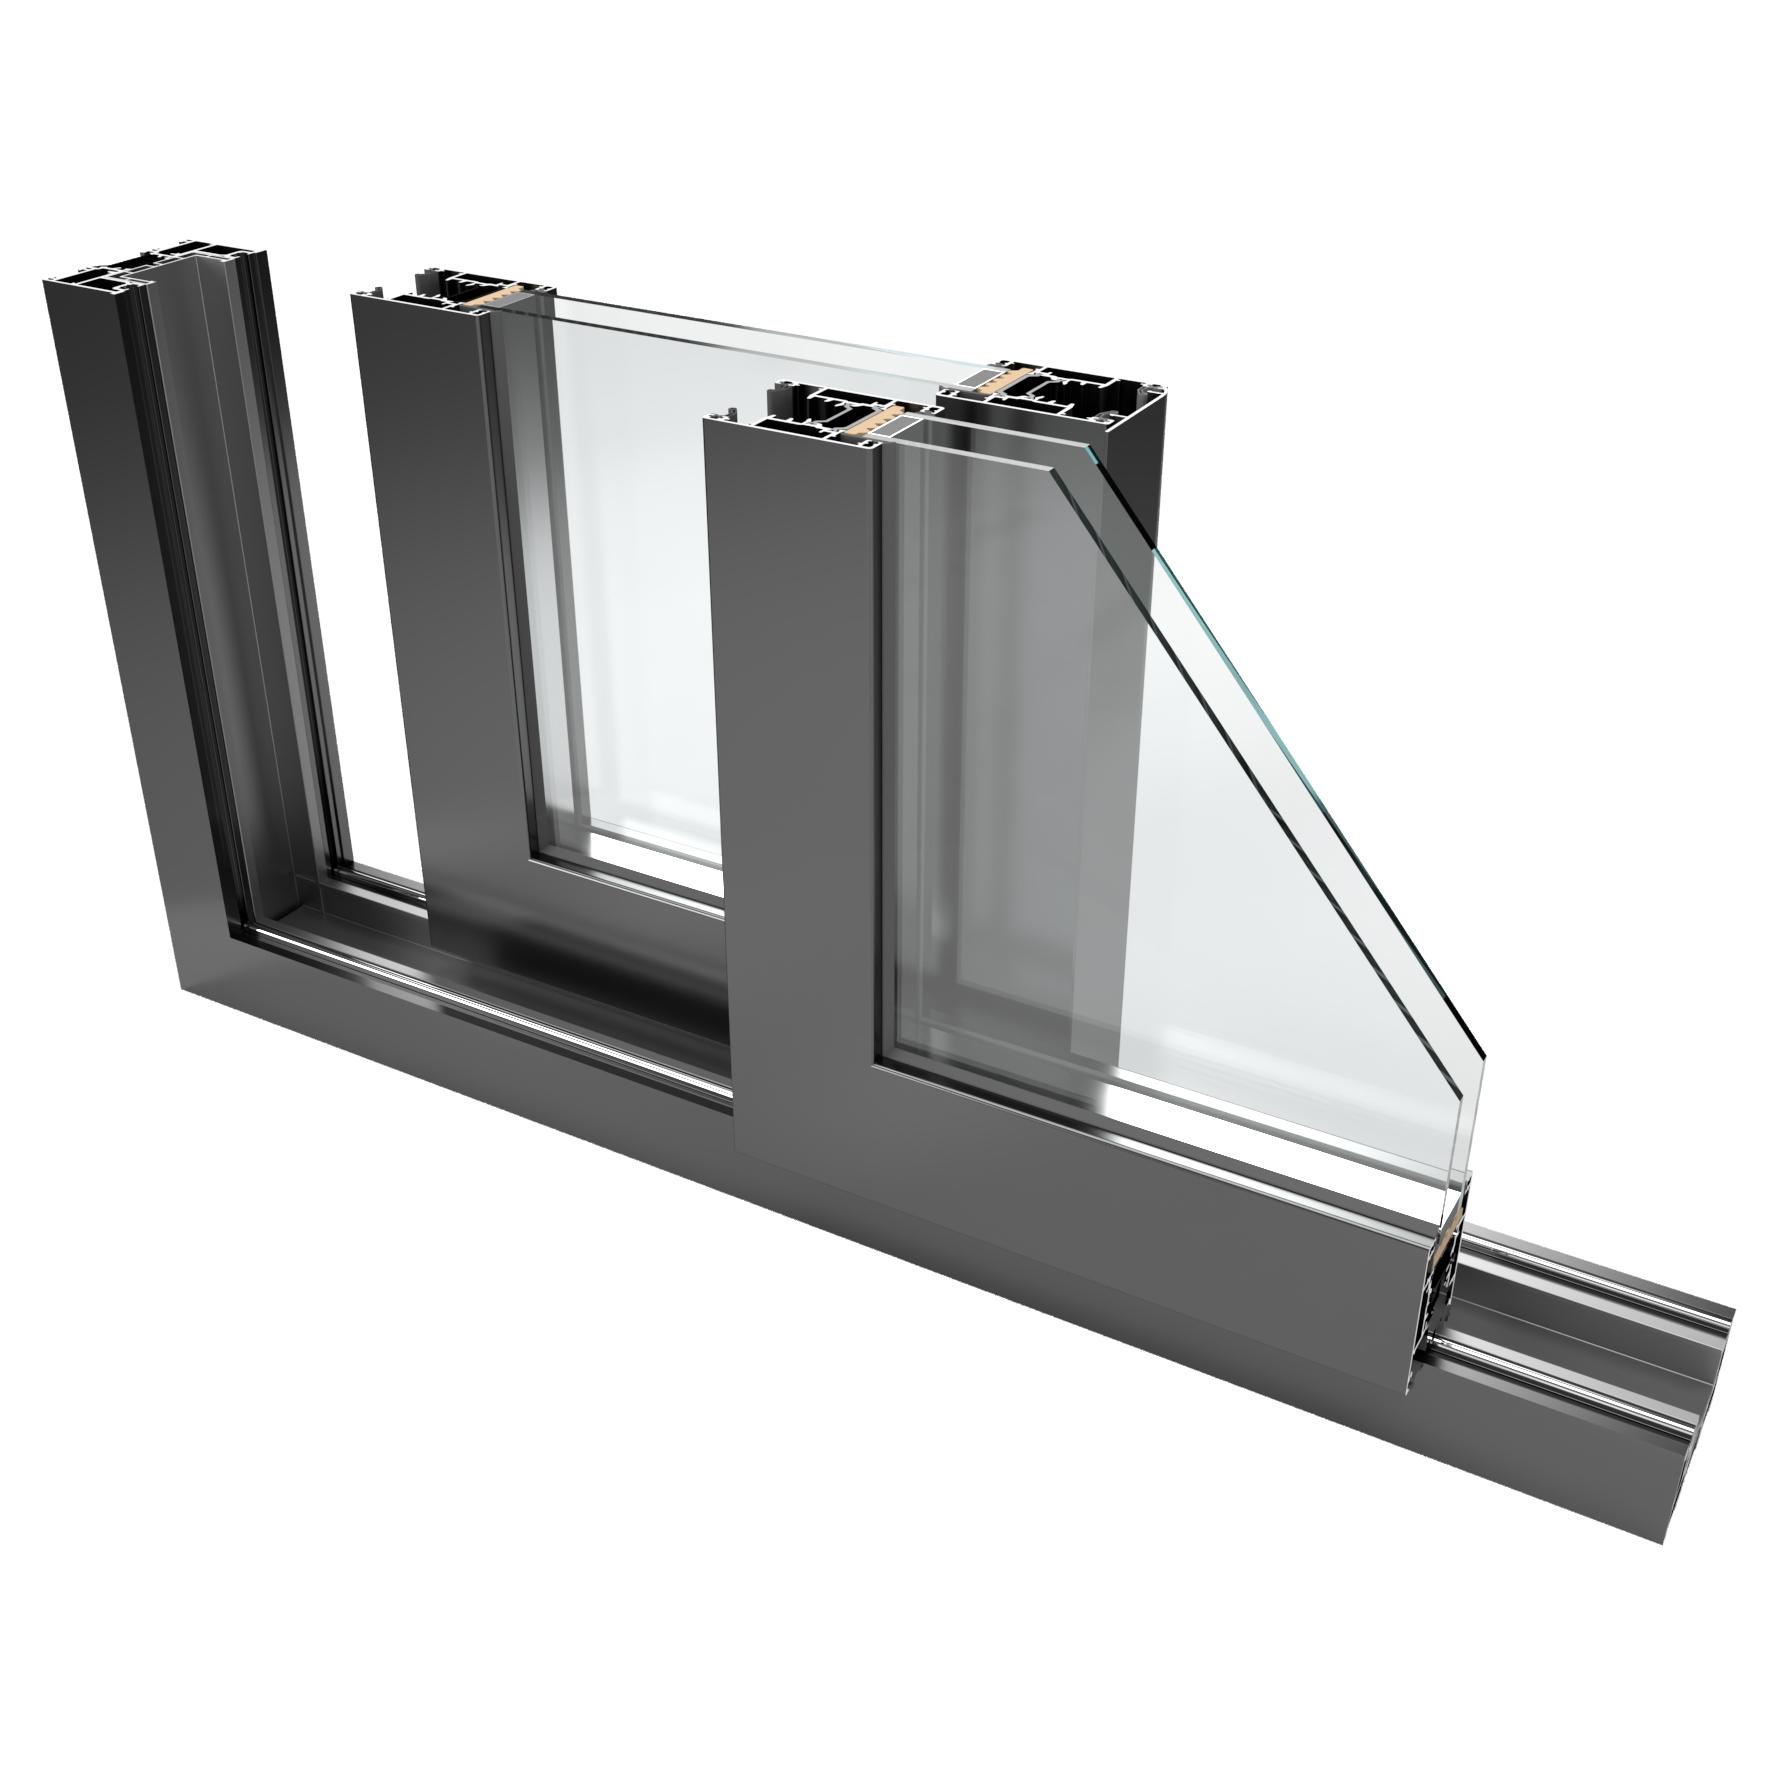 https://www.allpaint.it/wp-content/uploads/2021/07/scorrevoli-alluminio-thermika-gs90-allpaint.jpg